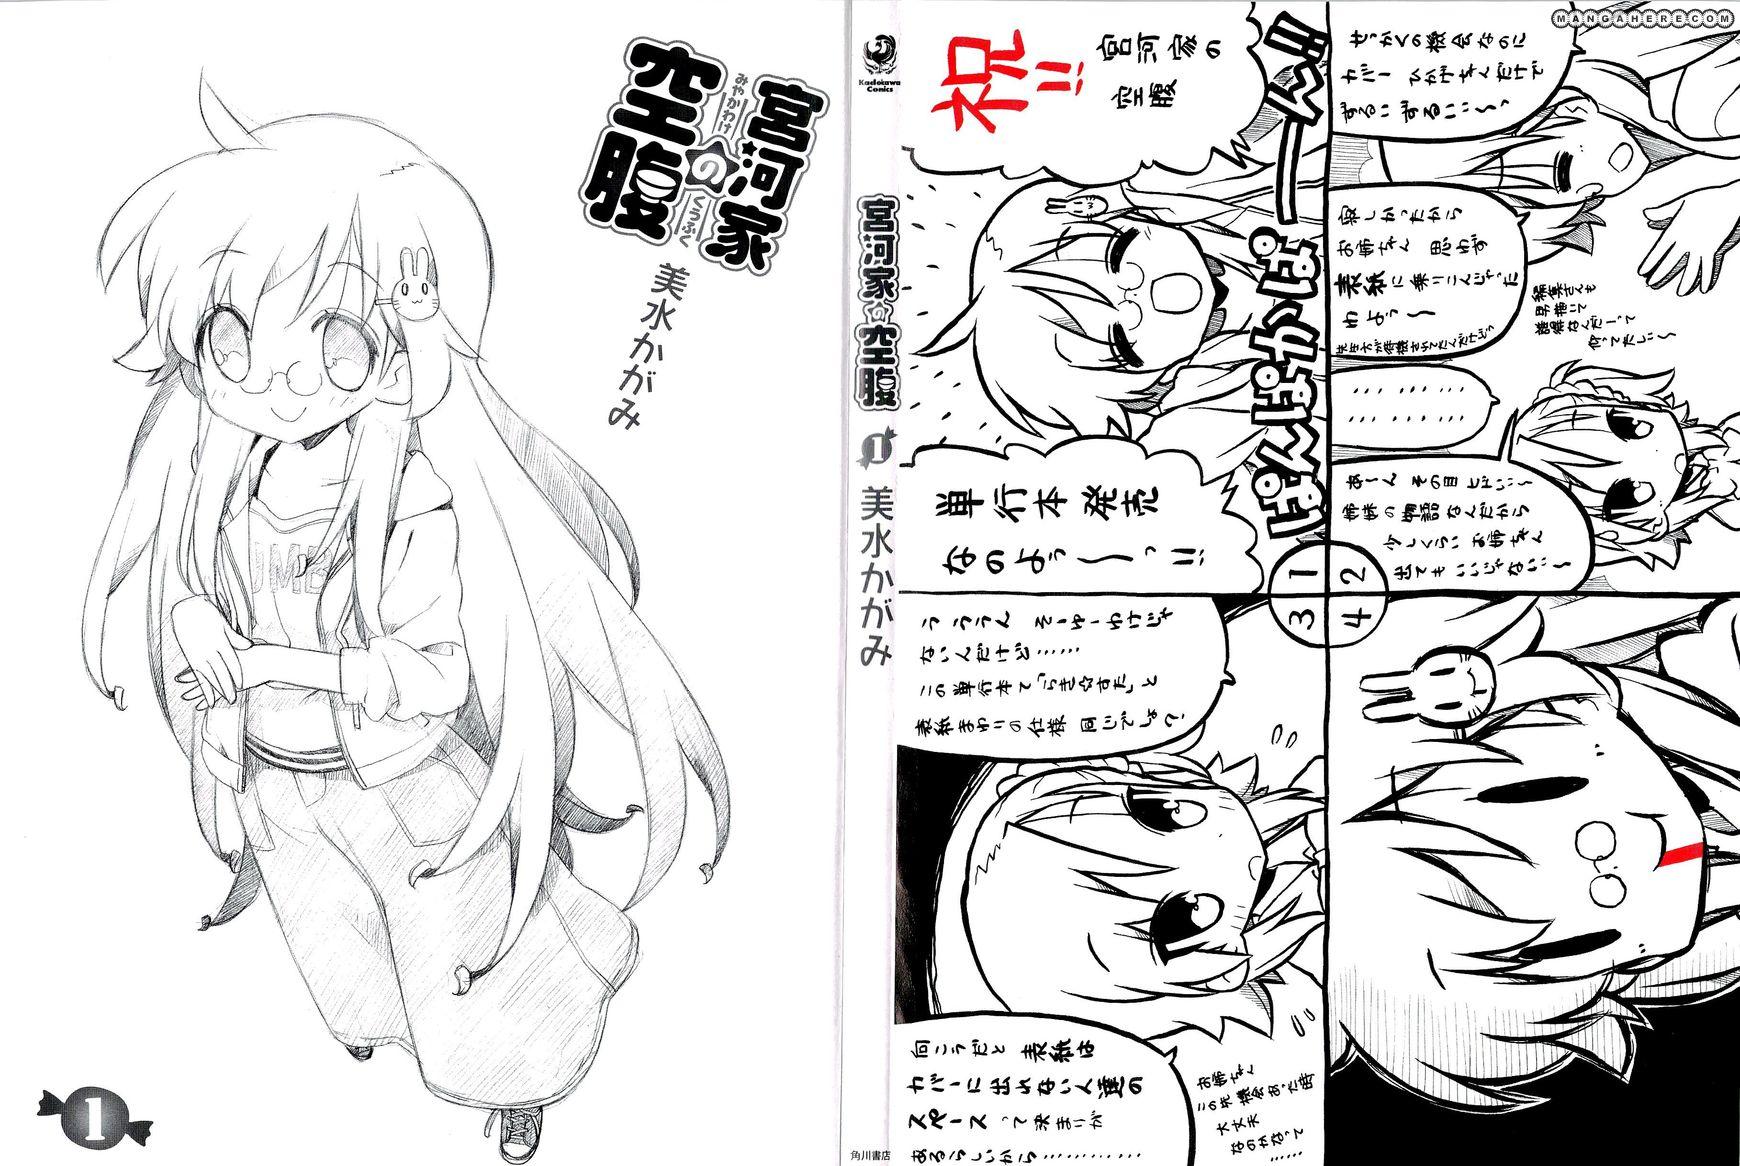 Miyakawake no Kuufuku 1 Page 2